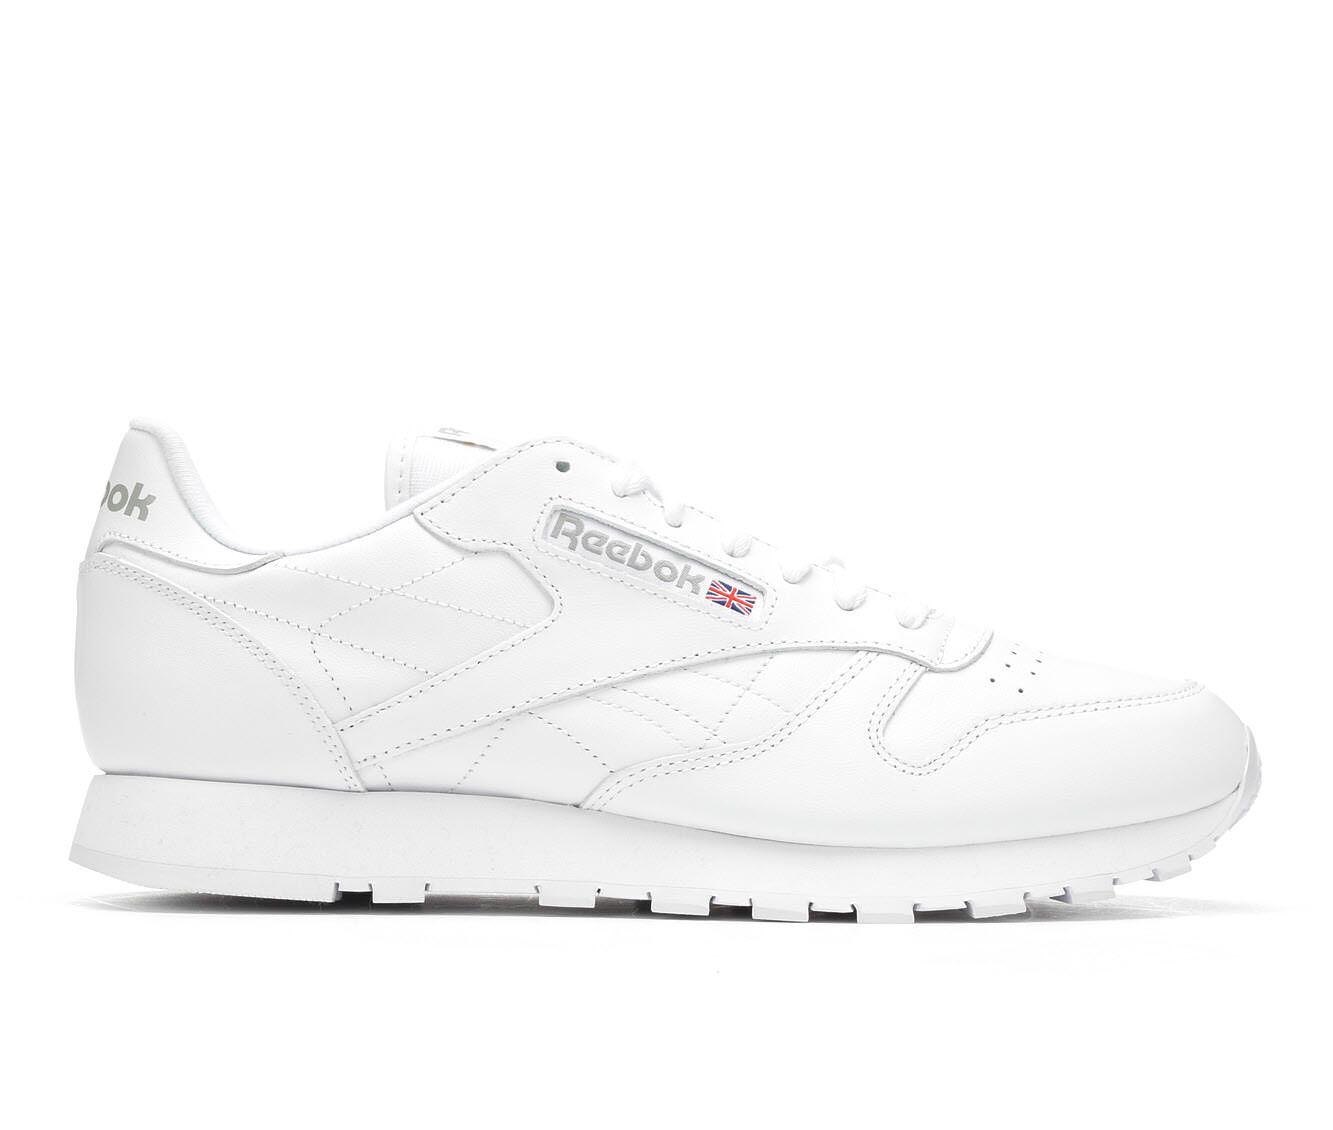 Men's Reebok Classic Leather Retro Sneakers White